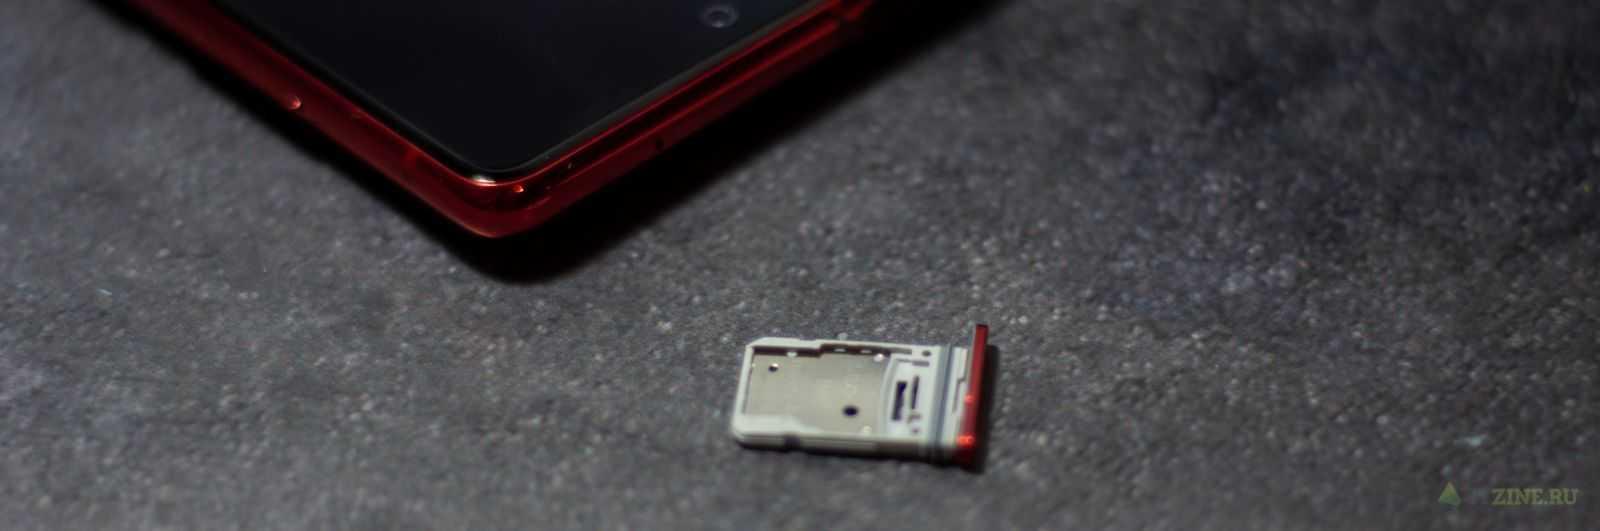 Обзор Samsung Galaxy S20 FE: недорогой, но флагман (DSC 9786)